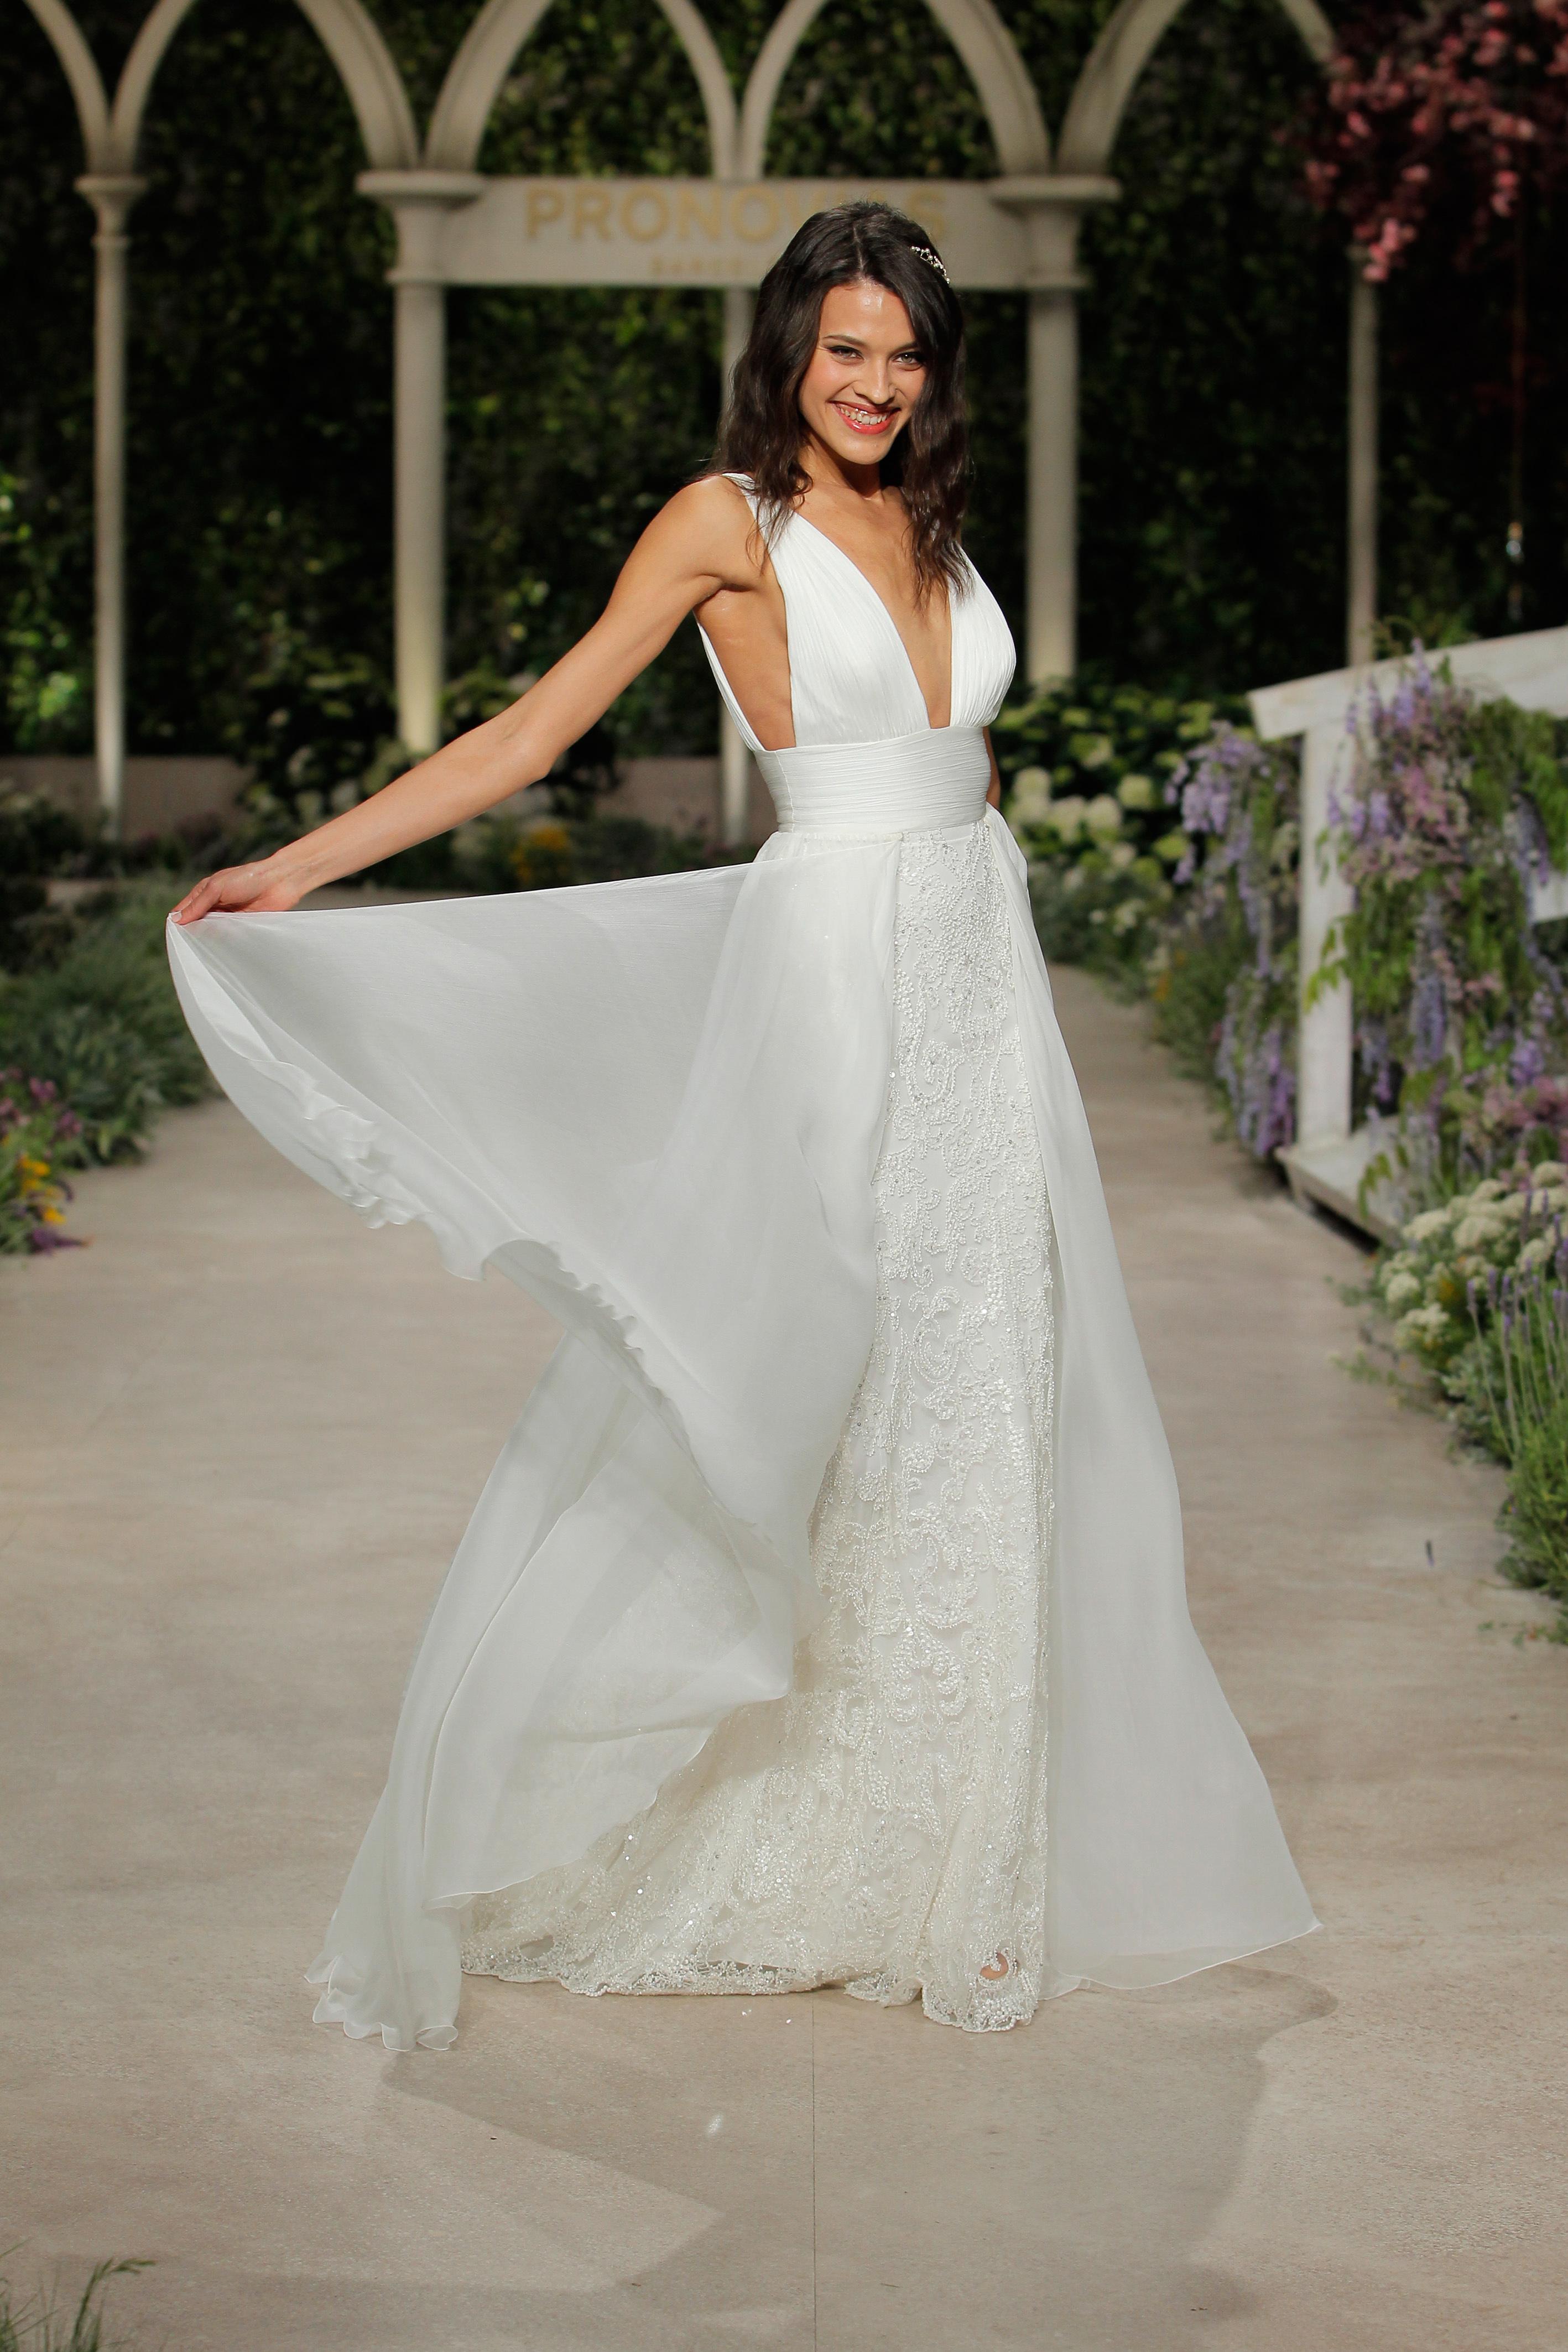 pronovias wedding dress spring 2019 lace layered v-neck